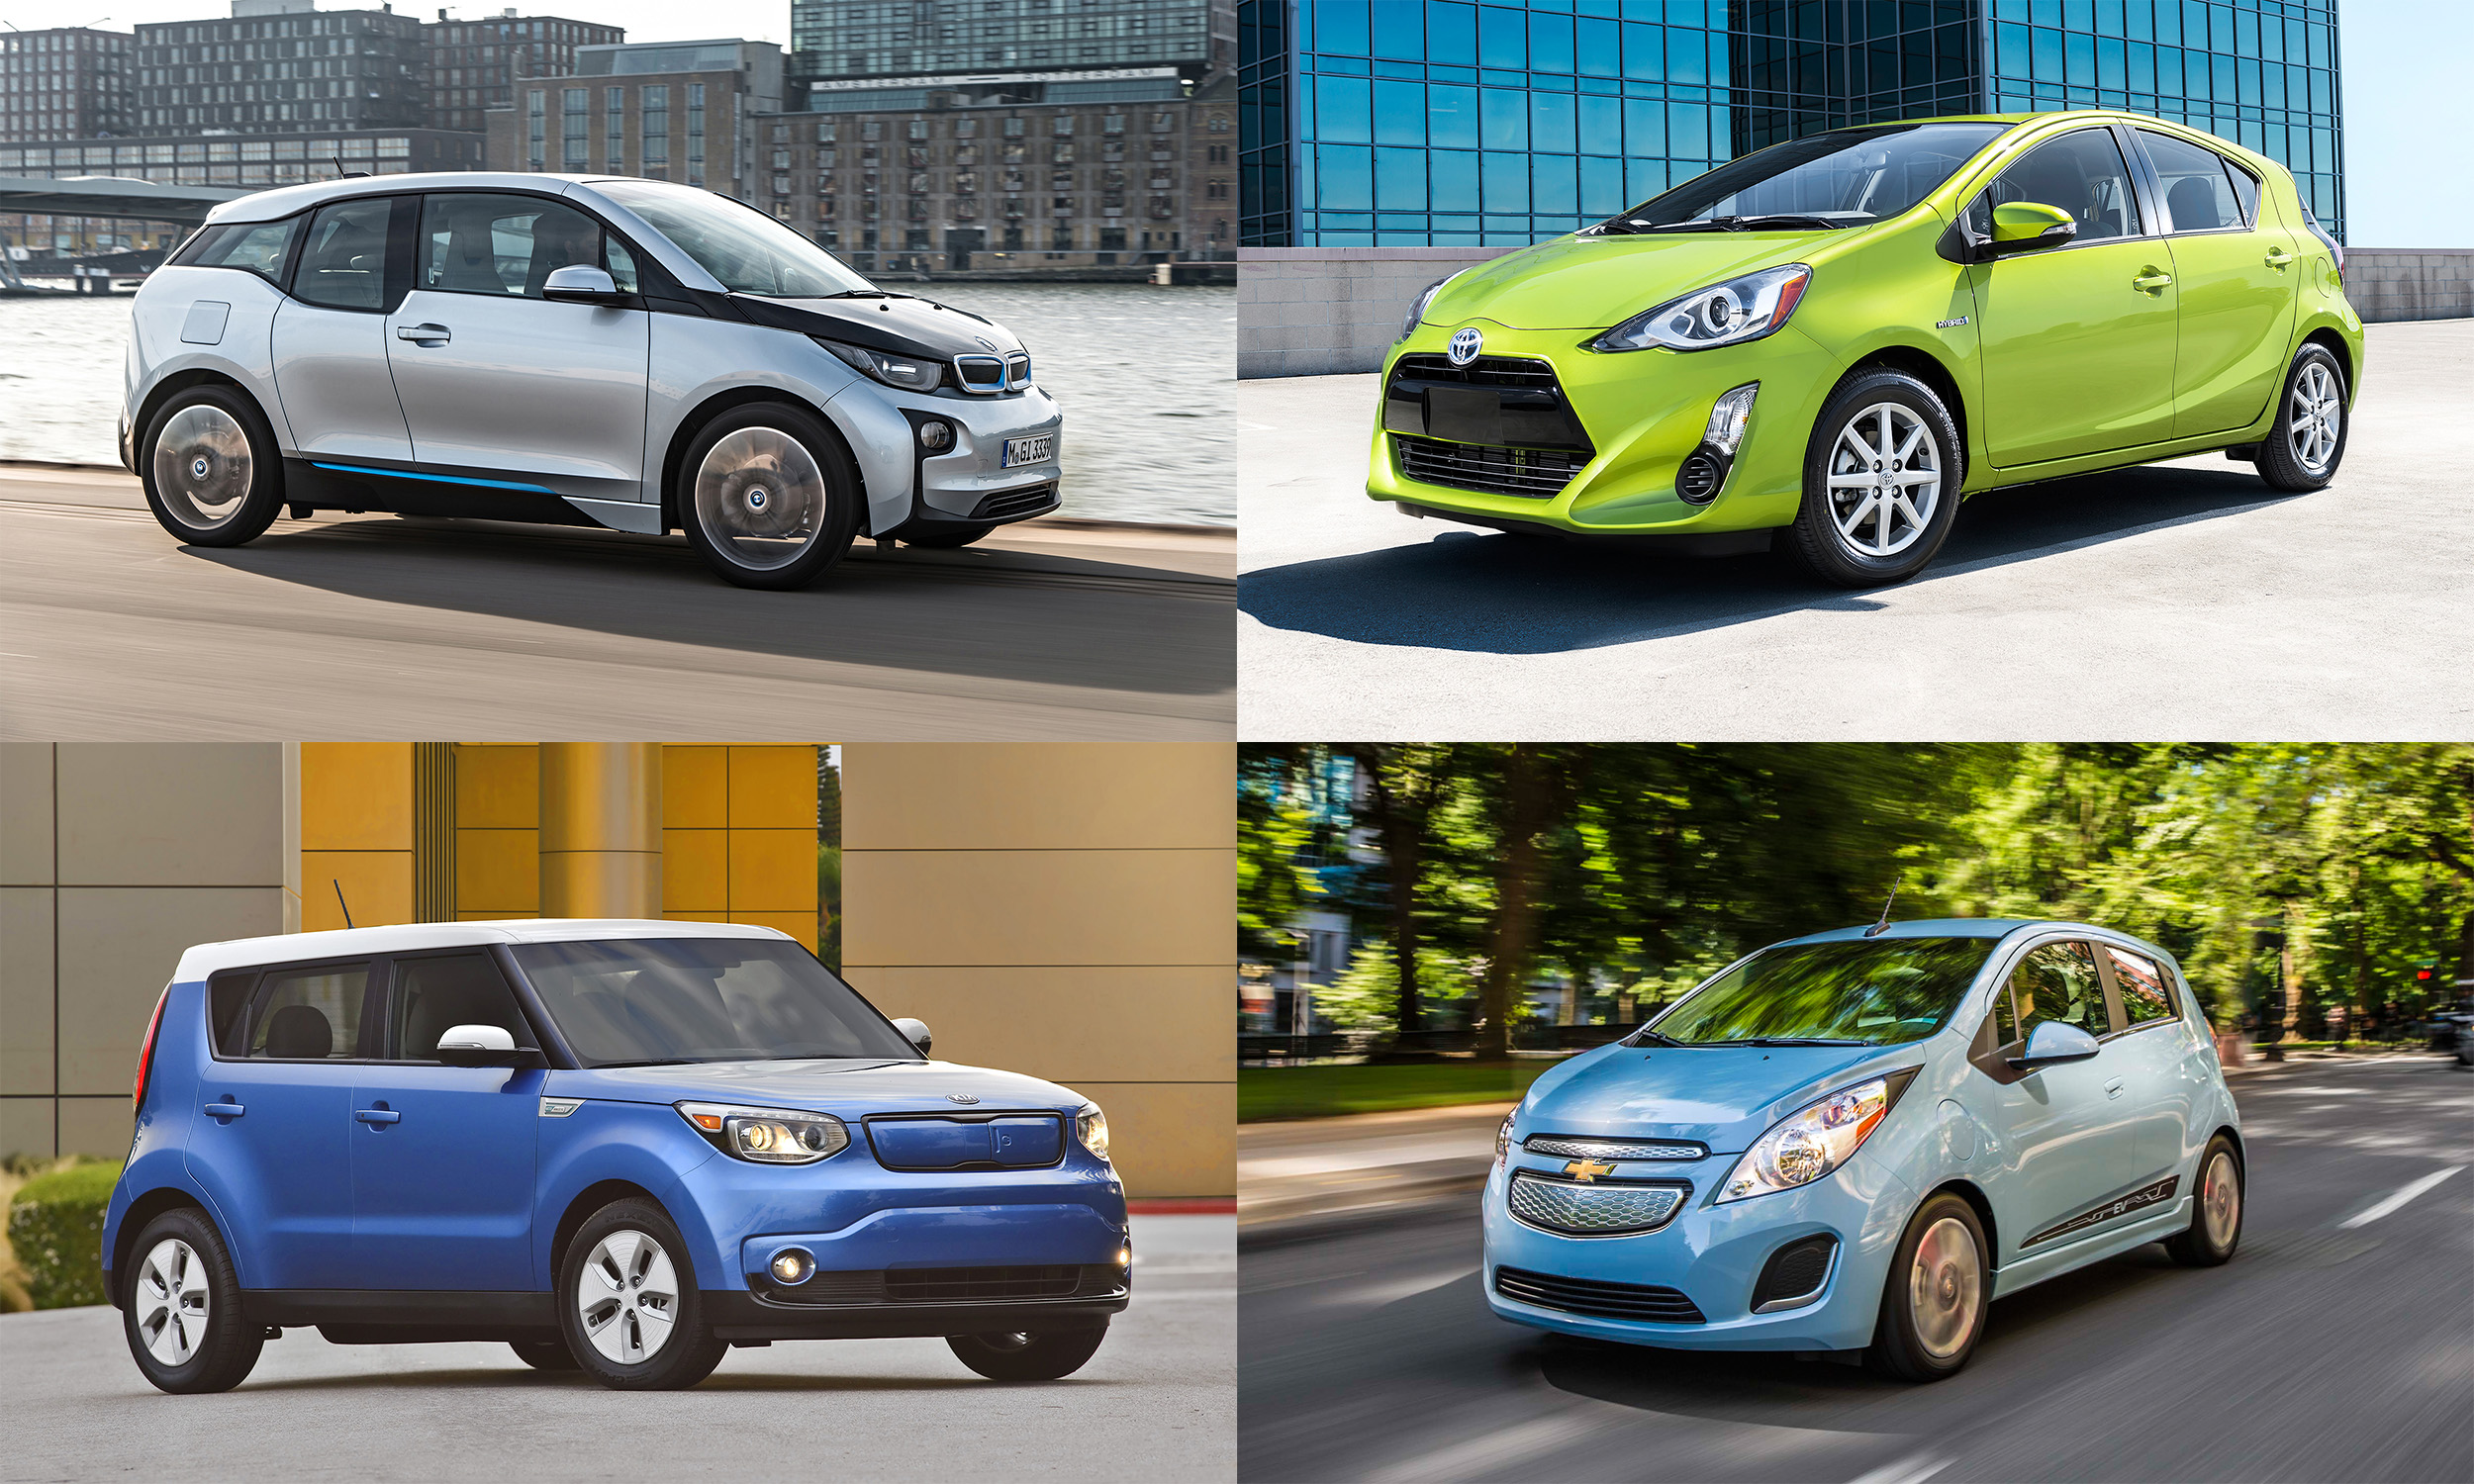 © BMW of North America, © General Motors, © Kia Motors America, © Toyota Motor Sales, U.S.A., Inc.